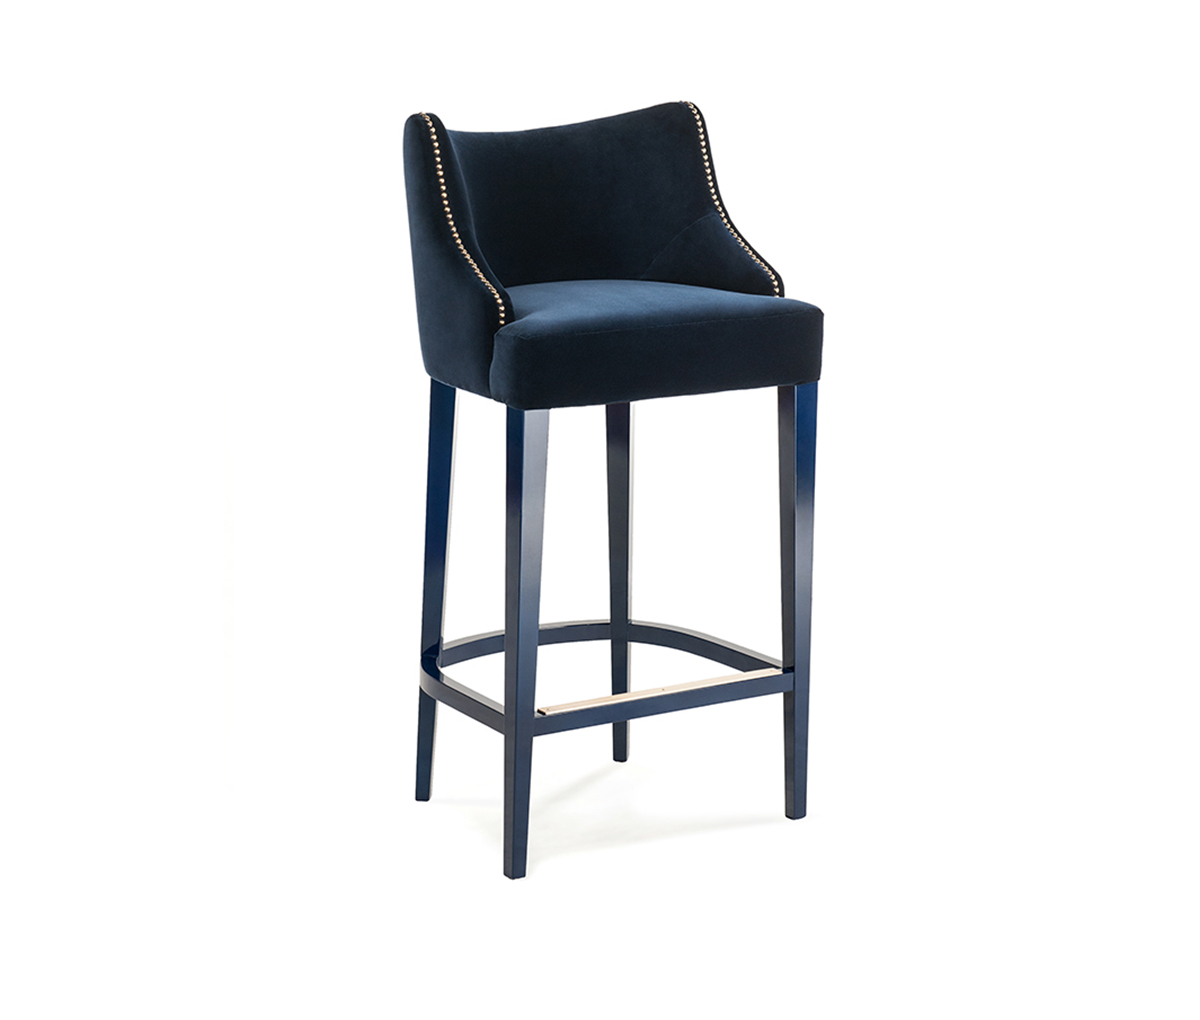 Munna (RU) Барный стул Becomes me от португальского бренда Munna